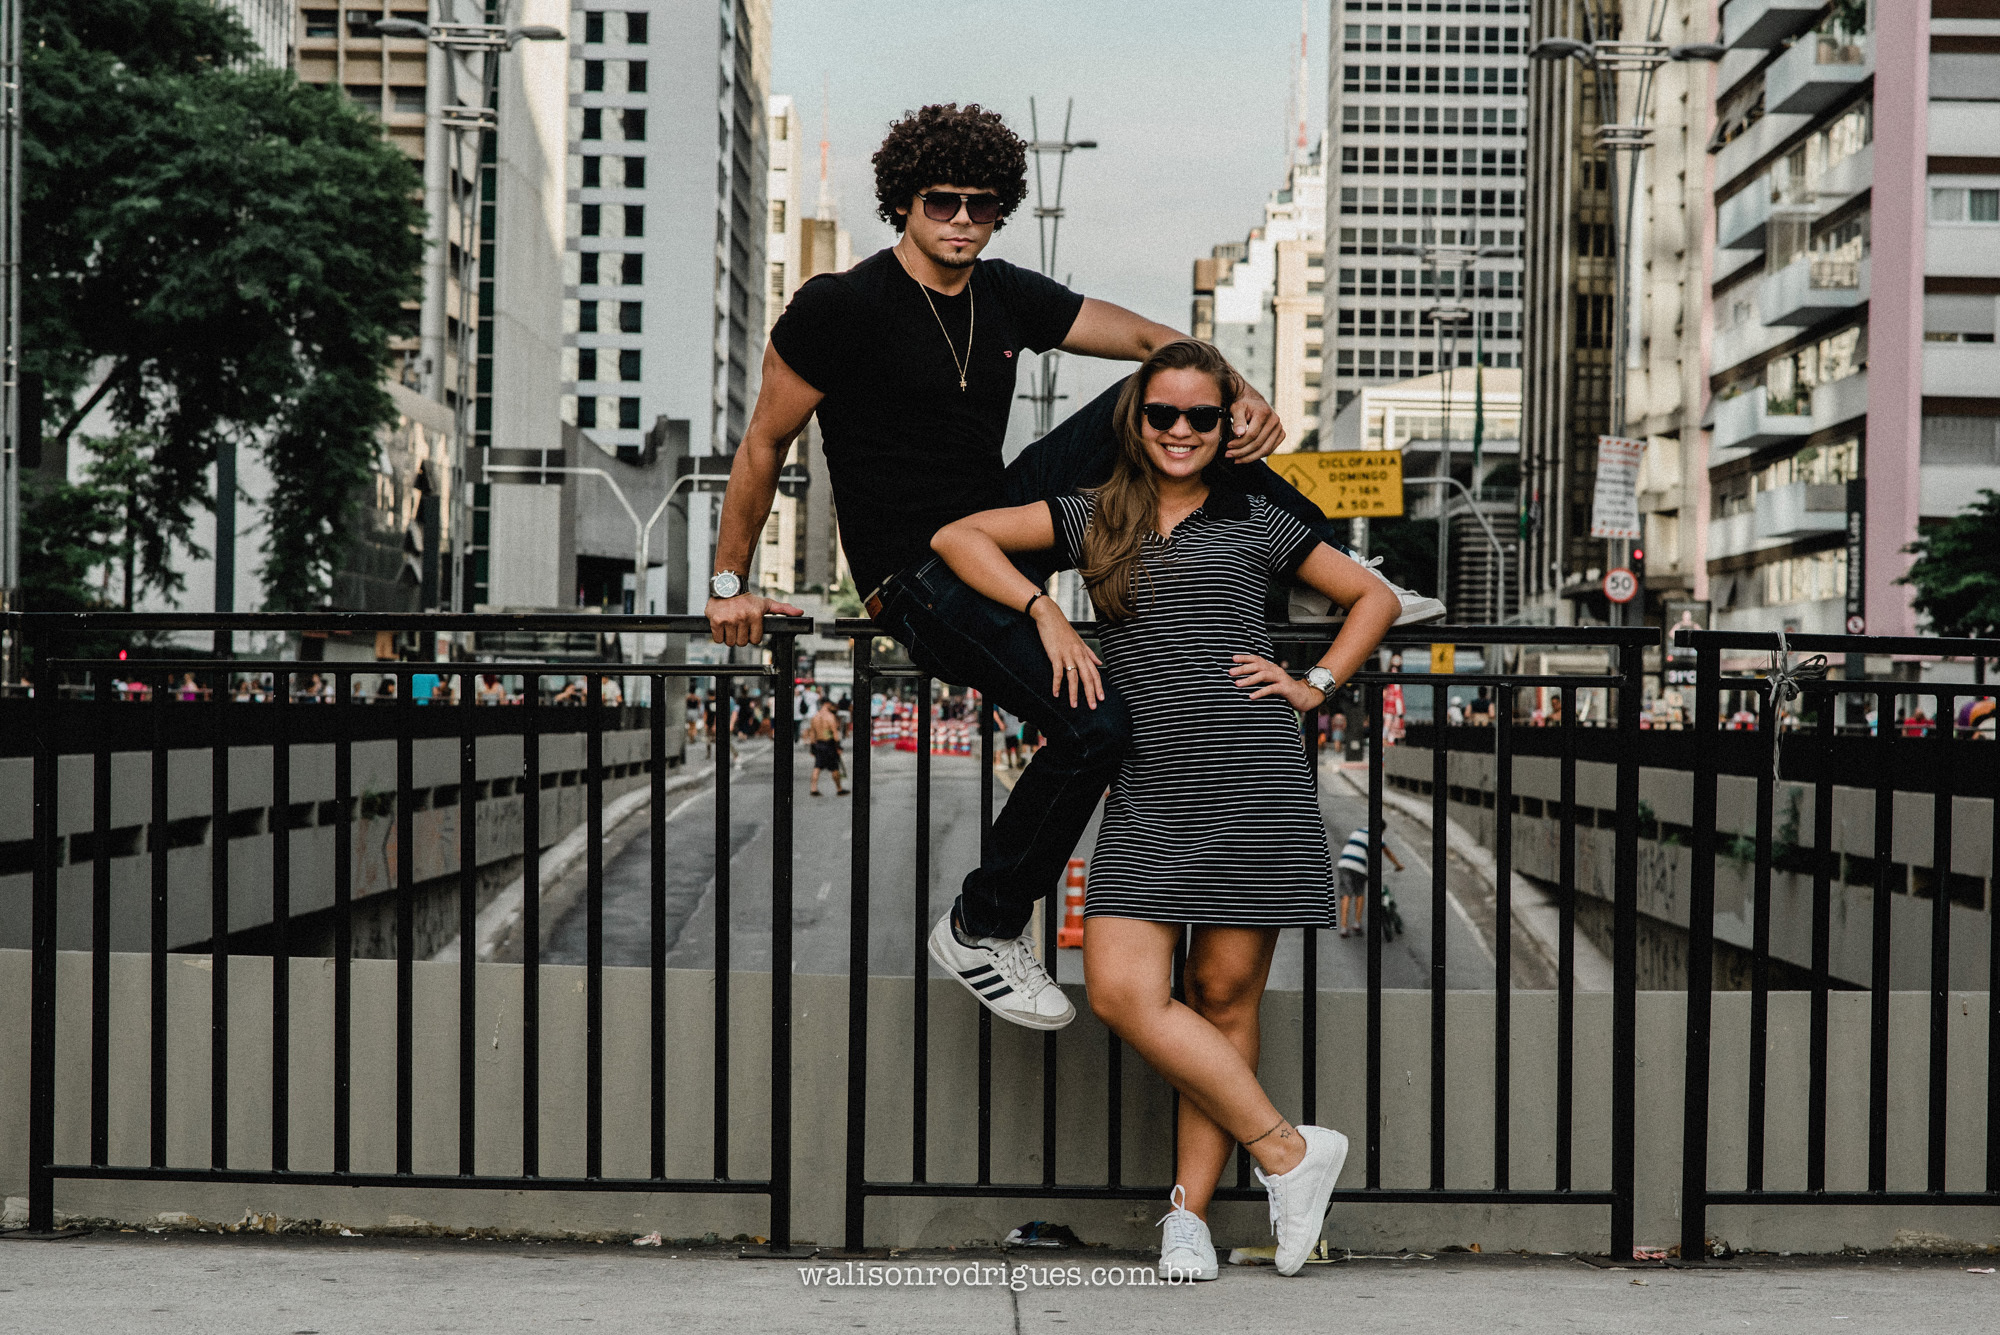 Contate Walison Rodrigues - Fotógrafo de Casamento em  Fortaleza -CE |